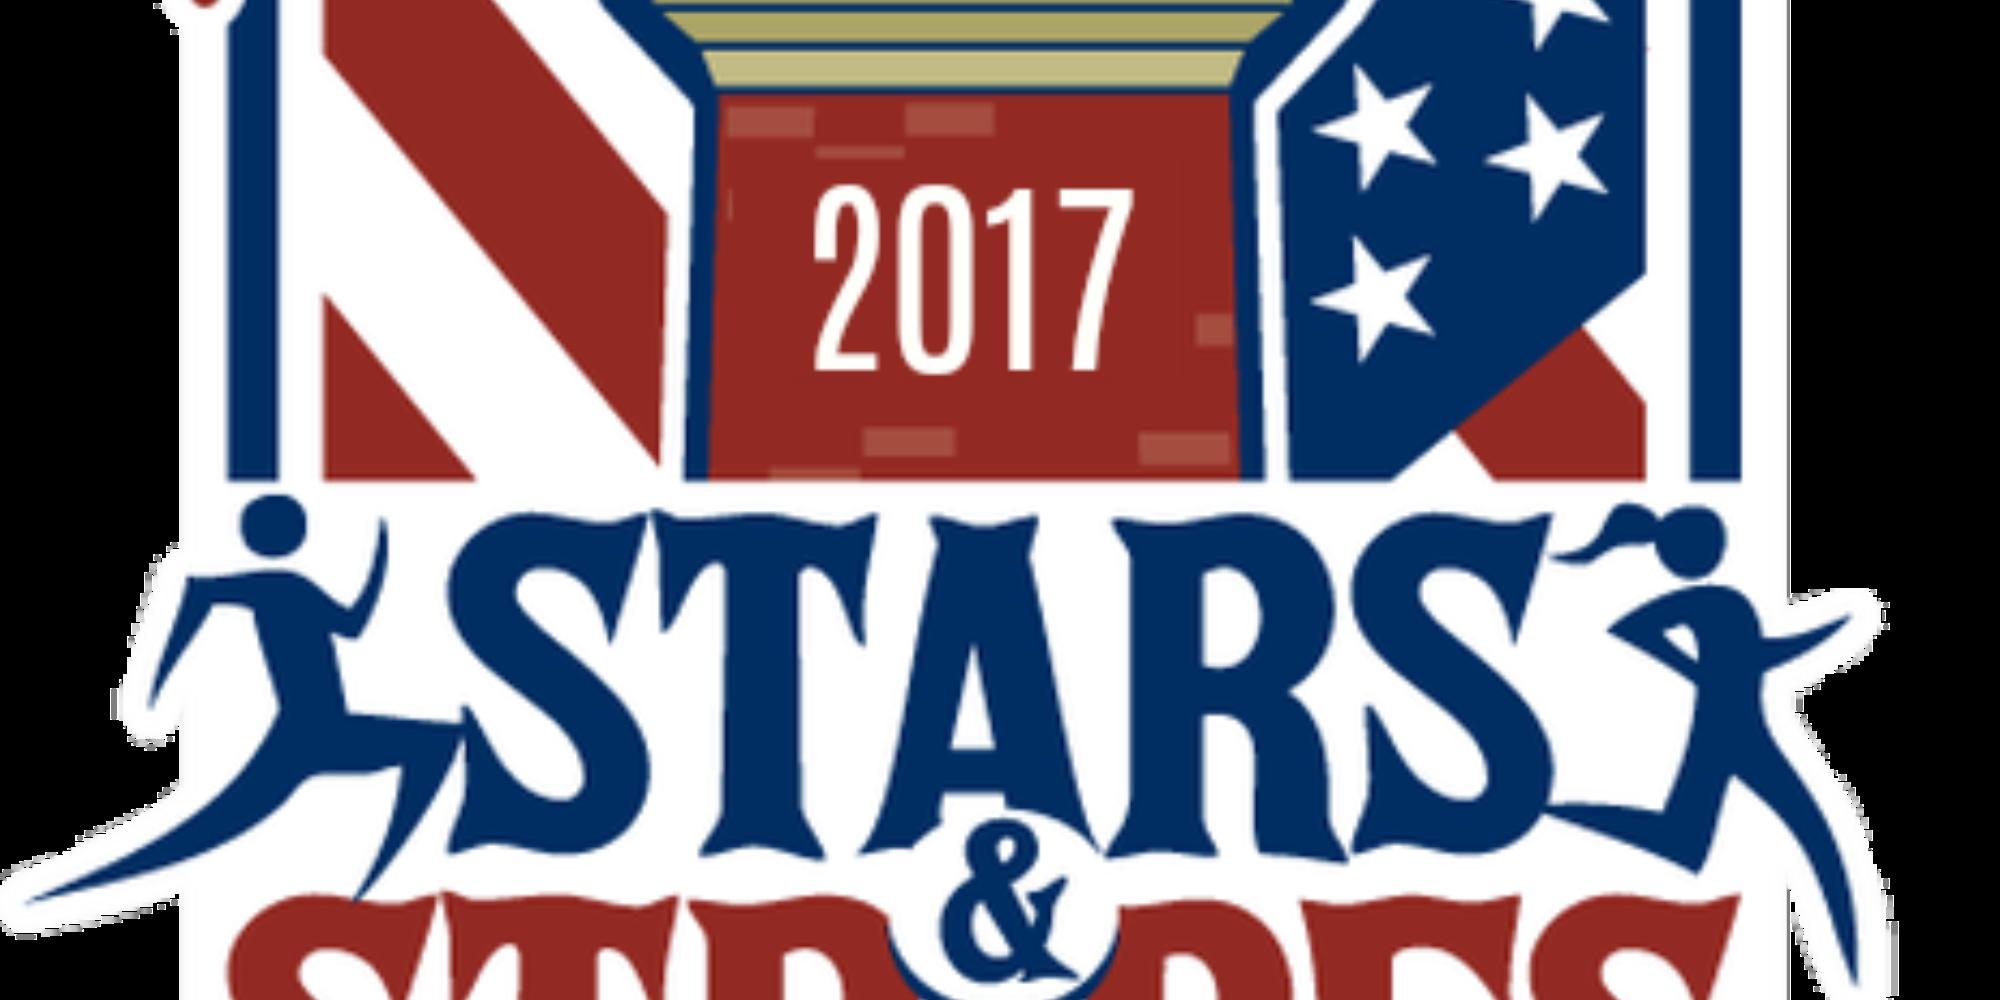 Stars and Stripes 5 K LS Banner